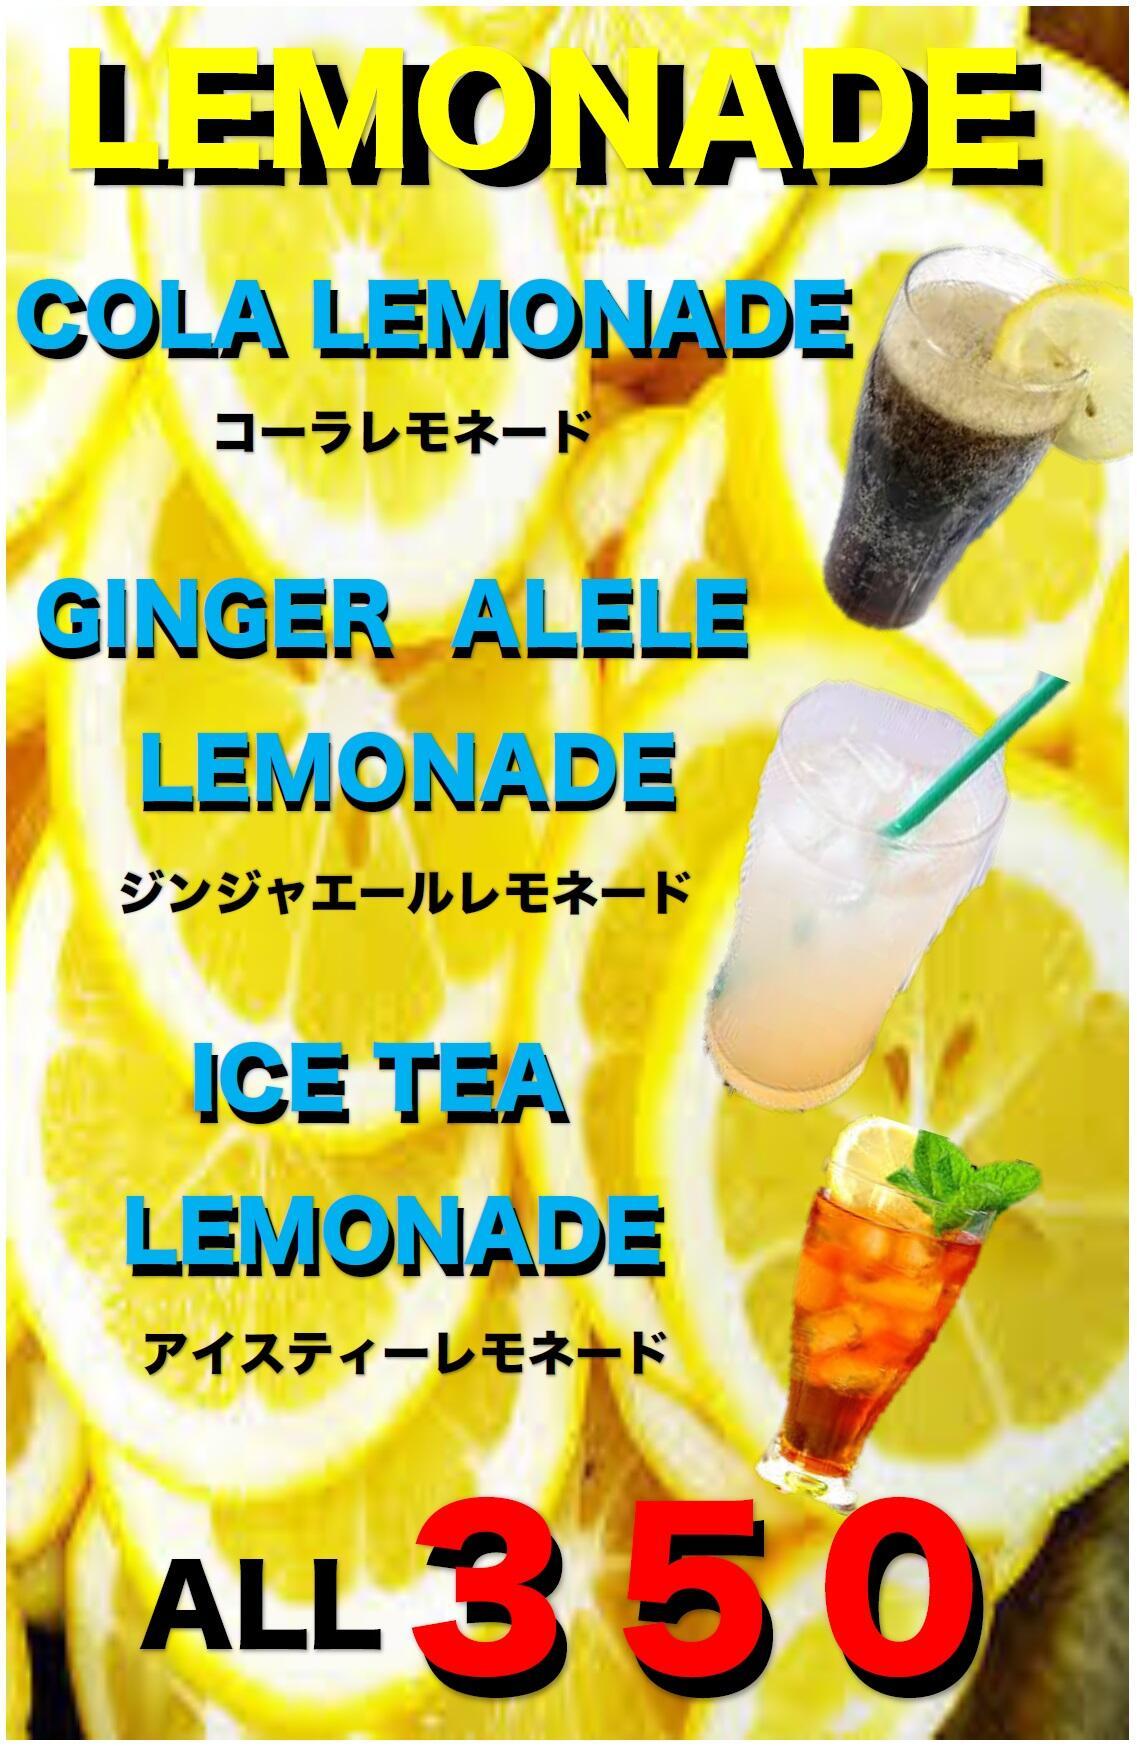 190720_lemonade2.jpg